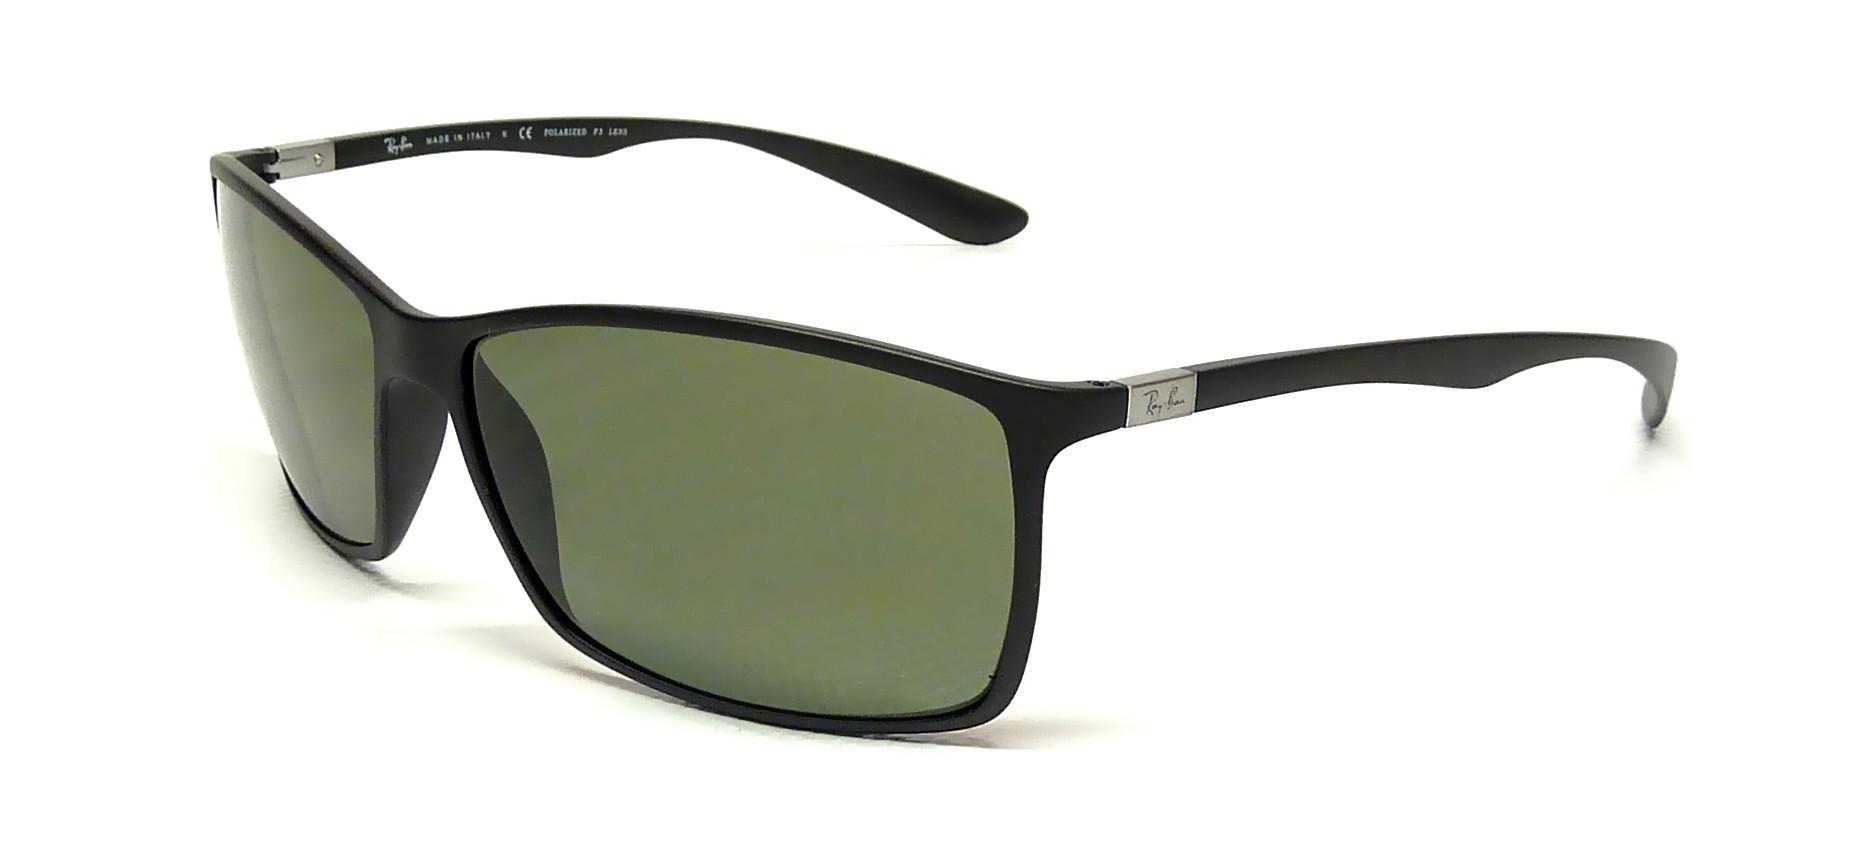 45a92a3b50 ... large mirror a81b3 f0cc3  authentic sunglasses ray ban tech liteforce  black rb4179 601s 9a 62 polarized 84a47 e22bc